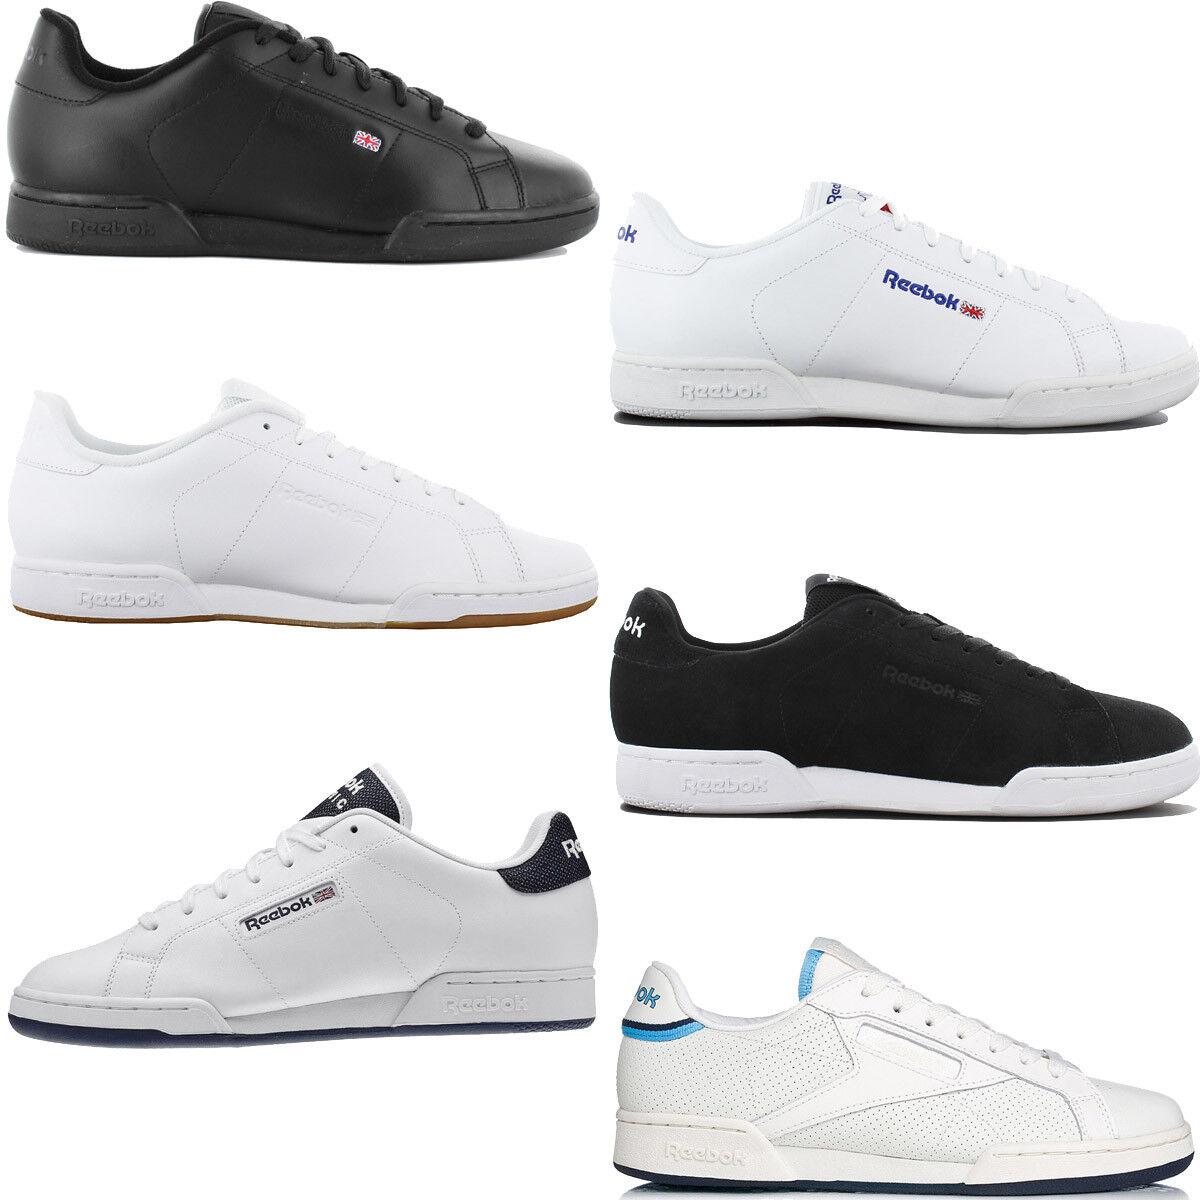 Reebok Classic NPC Leder Herren Sneaker Plus Leder Schuh Workout RBK Plus Sneaker Turnschuh 65ba92